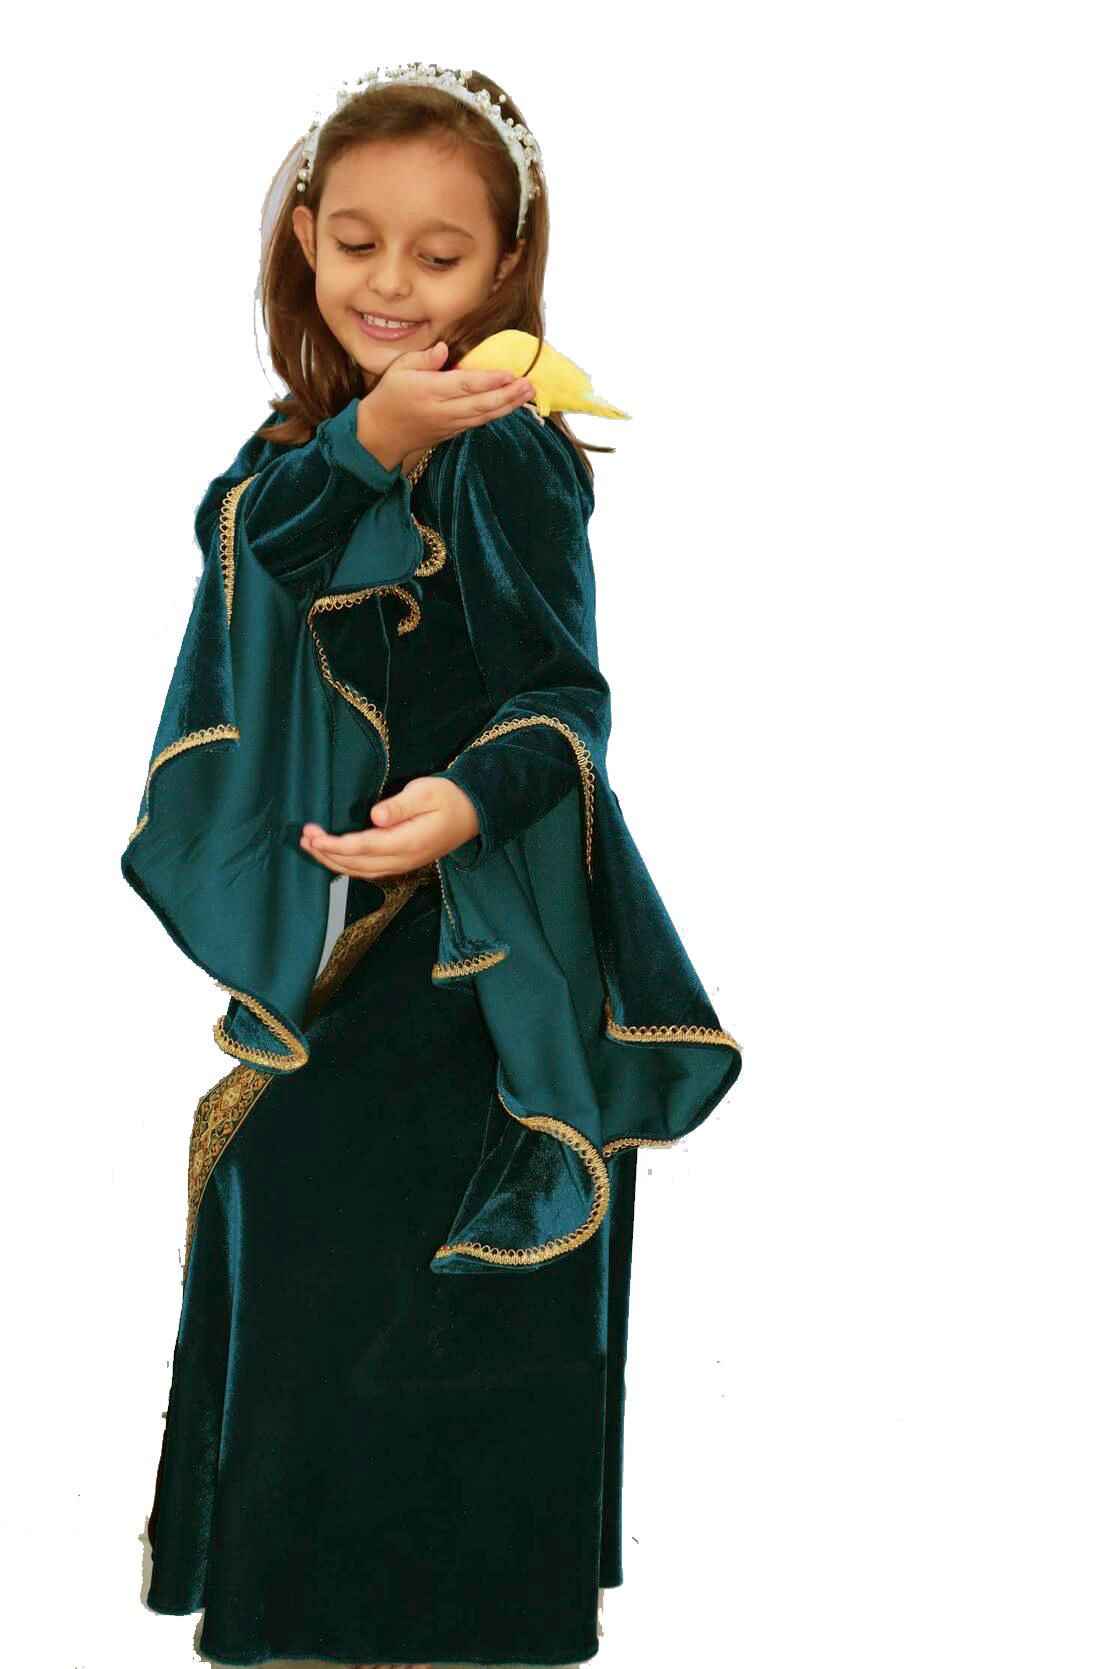 Vestido Verde Medieval Princesa Elfa Infantil